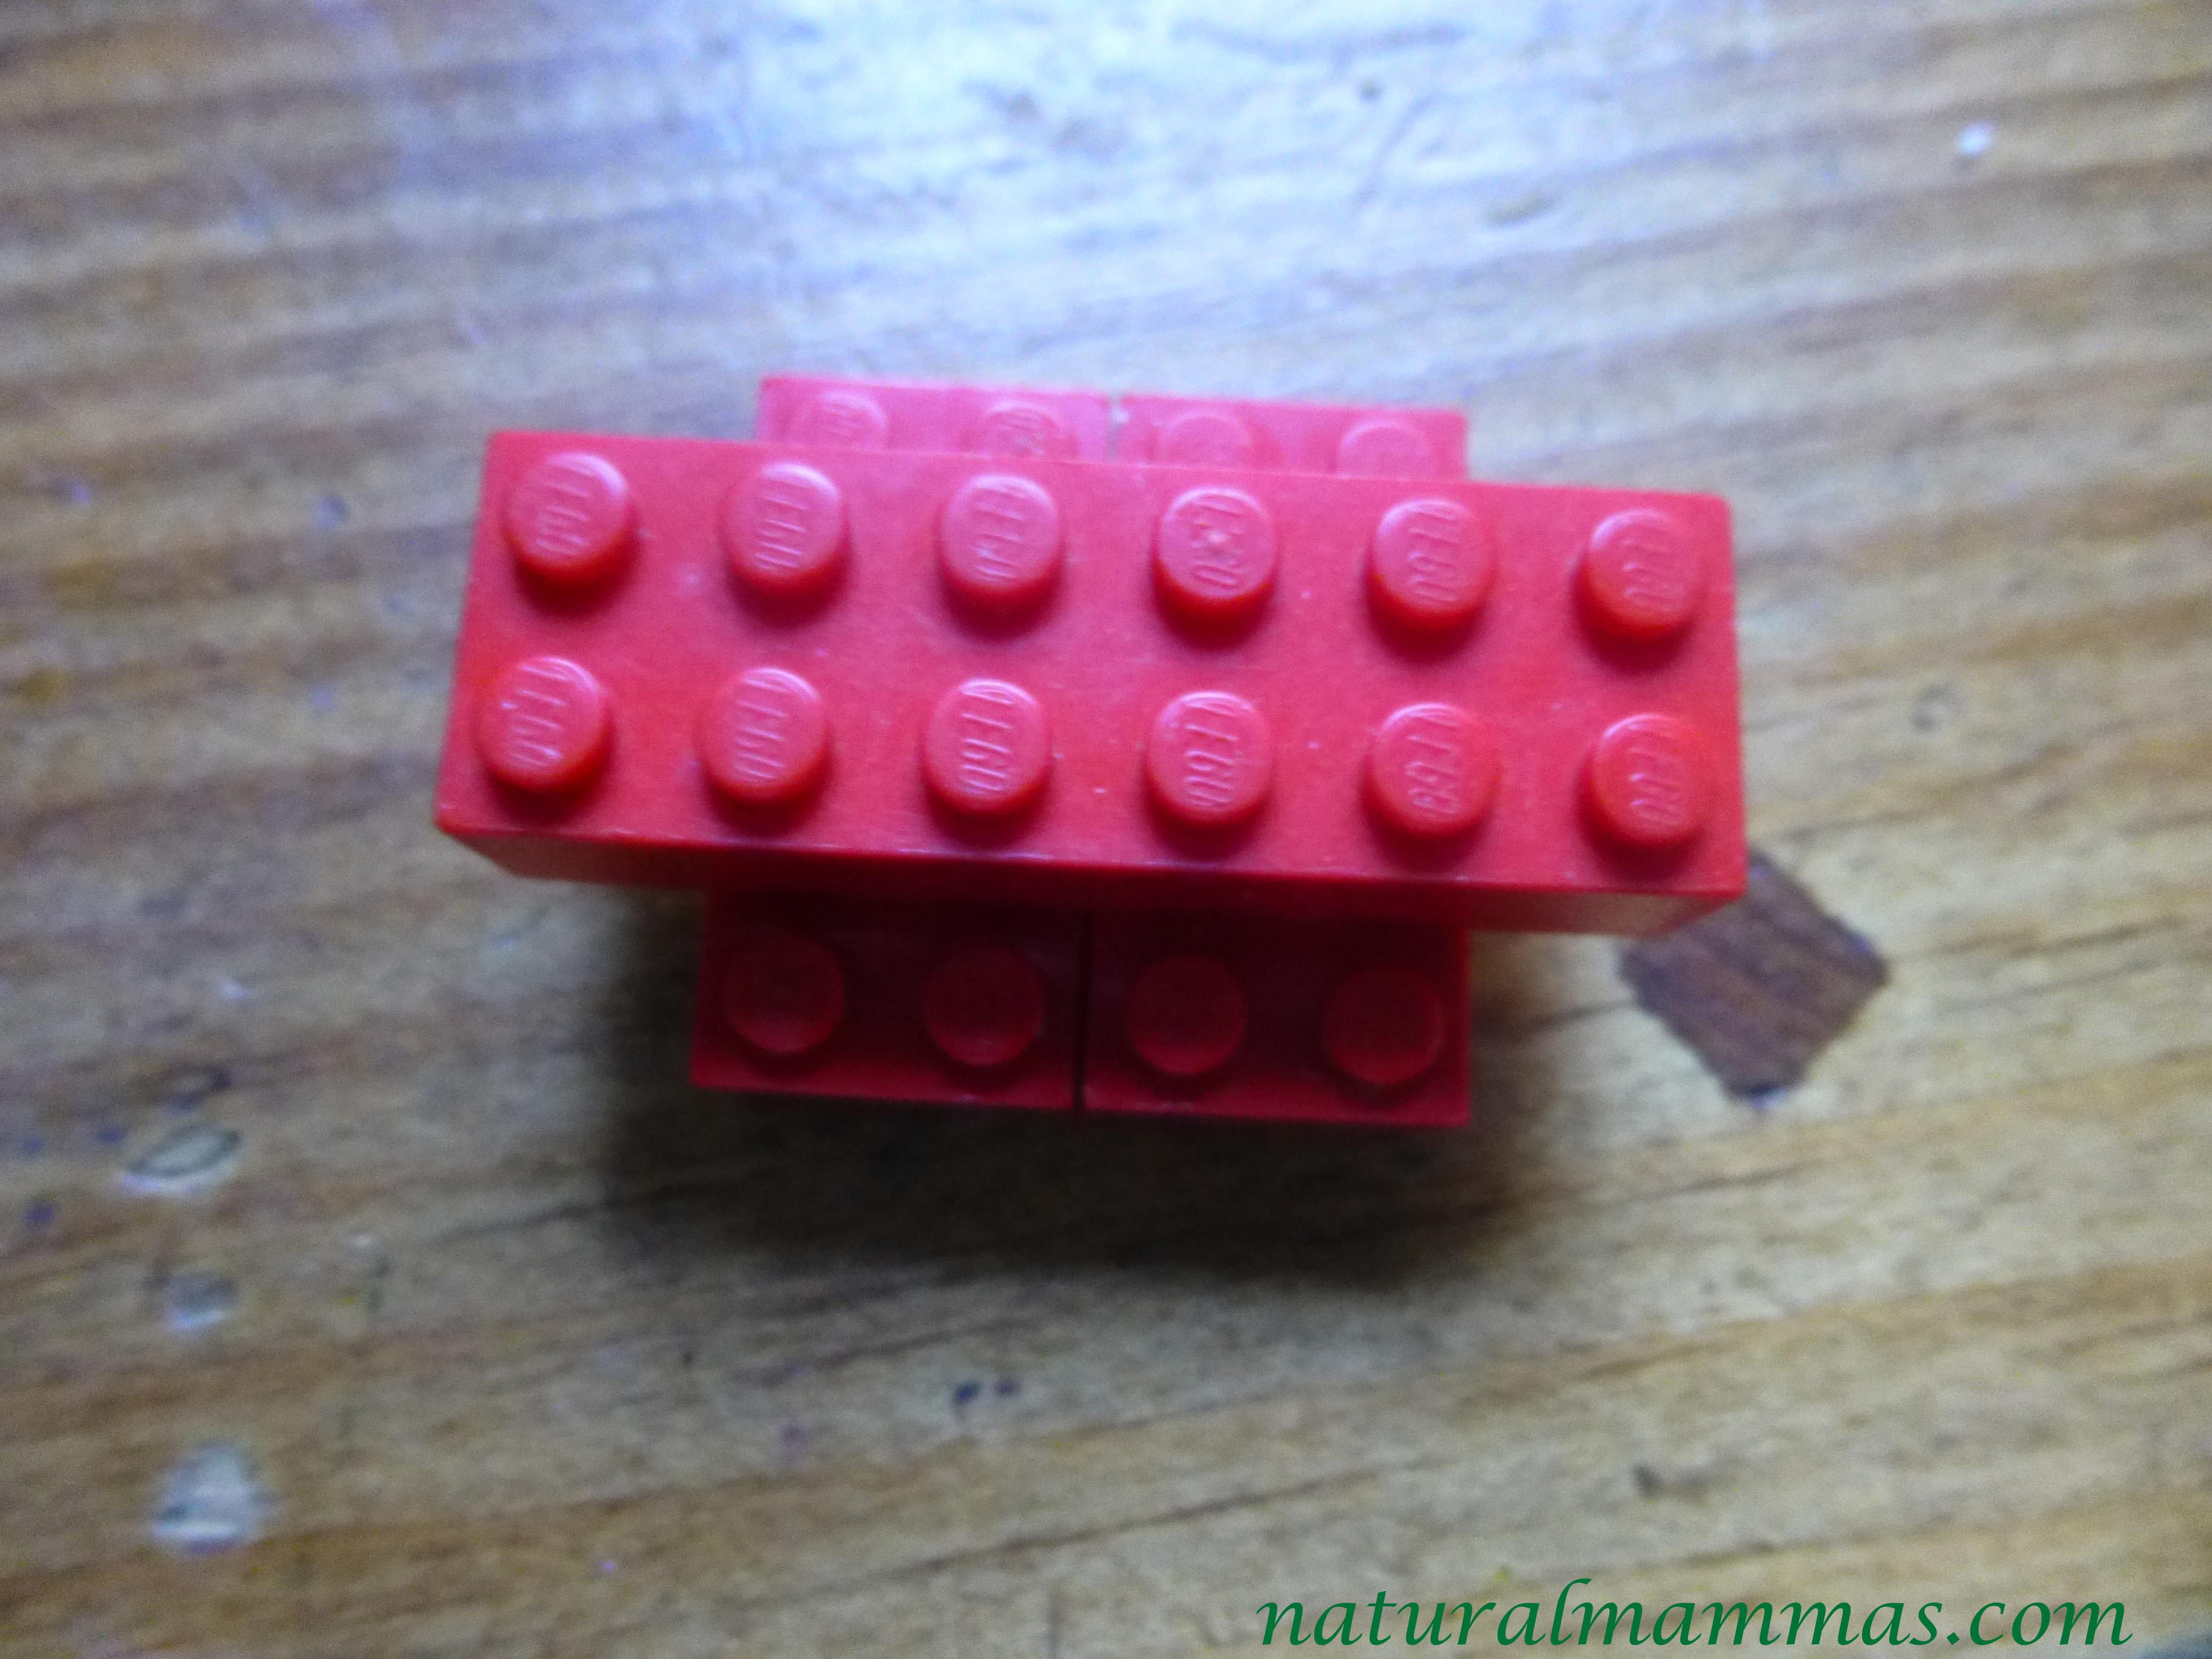 lego christmas tree instructions step one - the base